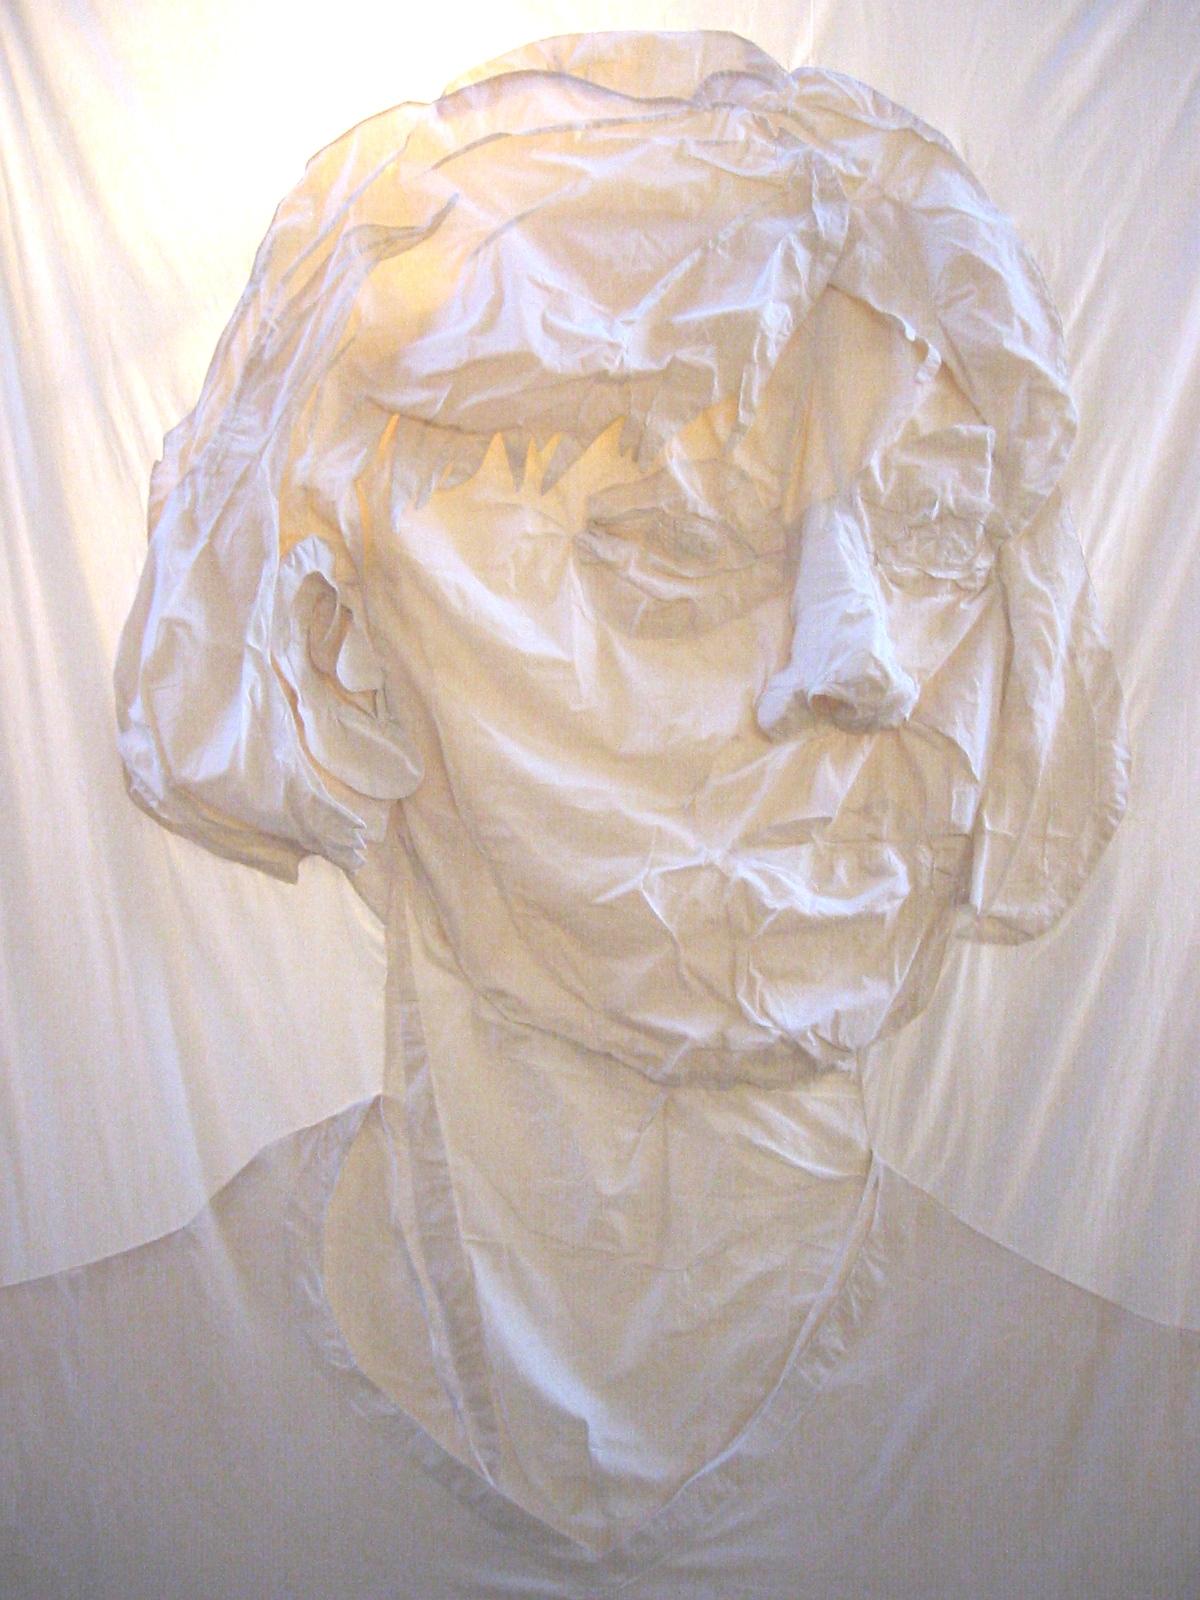 Stoffen zelfportret, 2004 met verlichting lxbxhx 265x340x20 cm